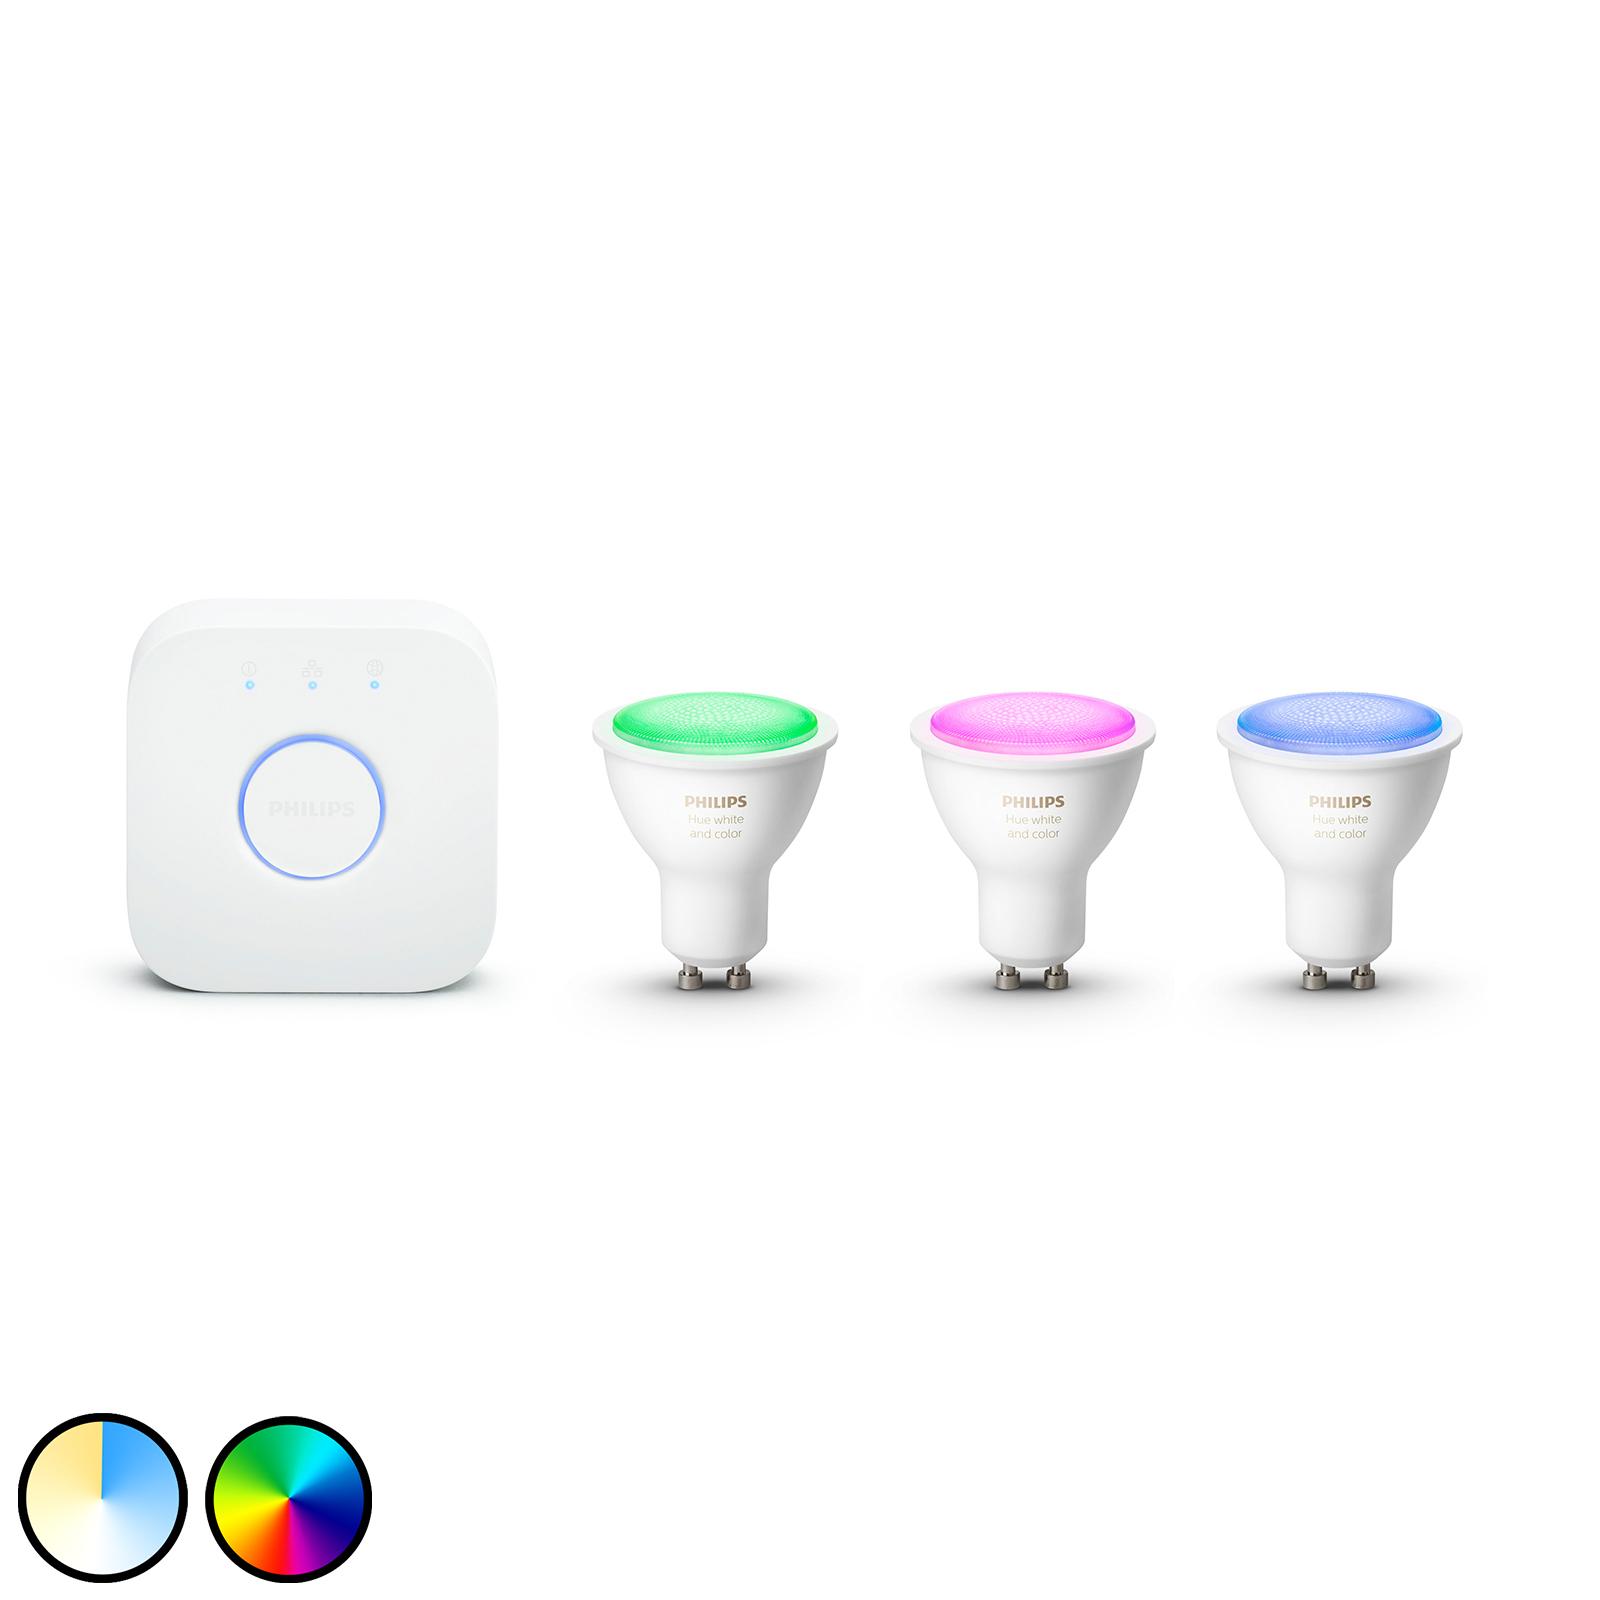 Philips Hue White & Color Ambiance GU10 LED